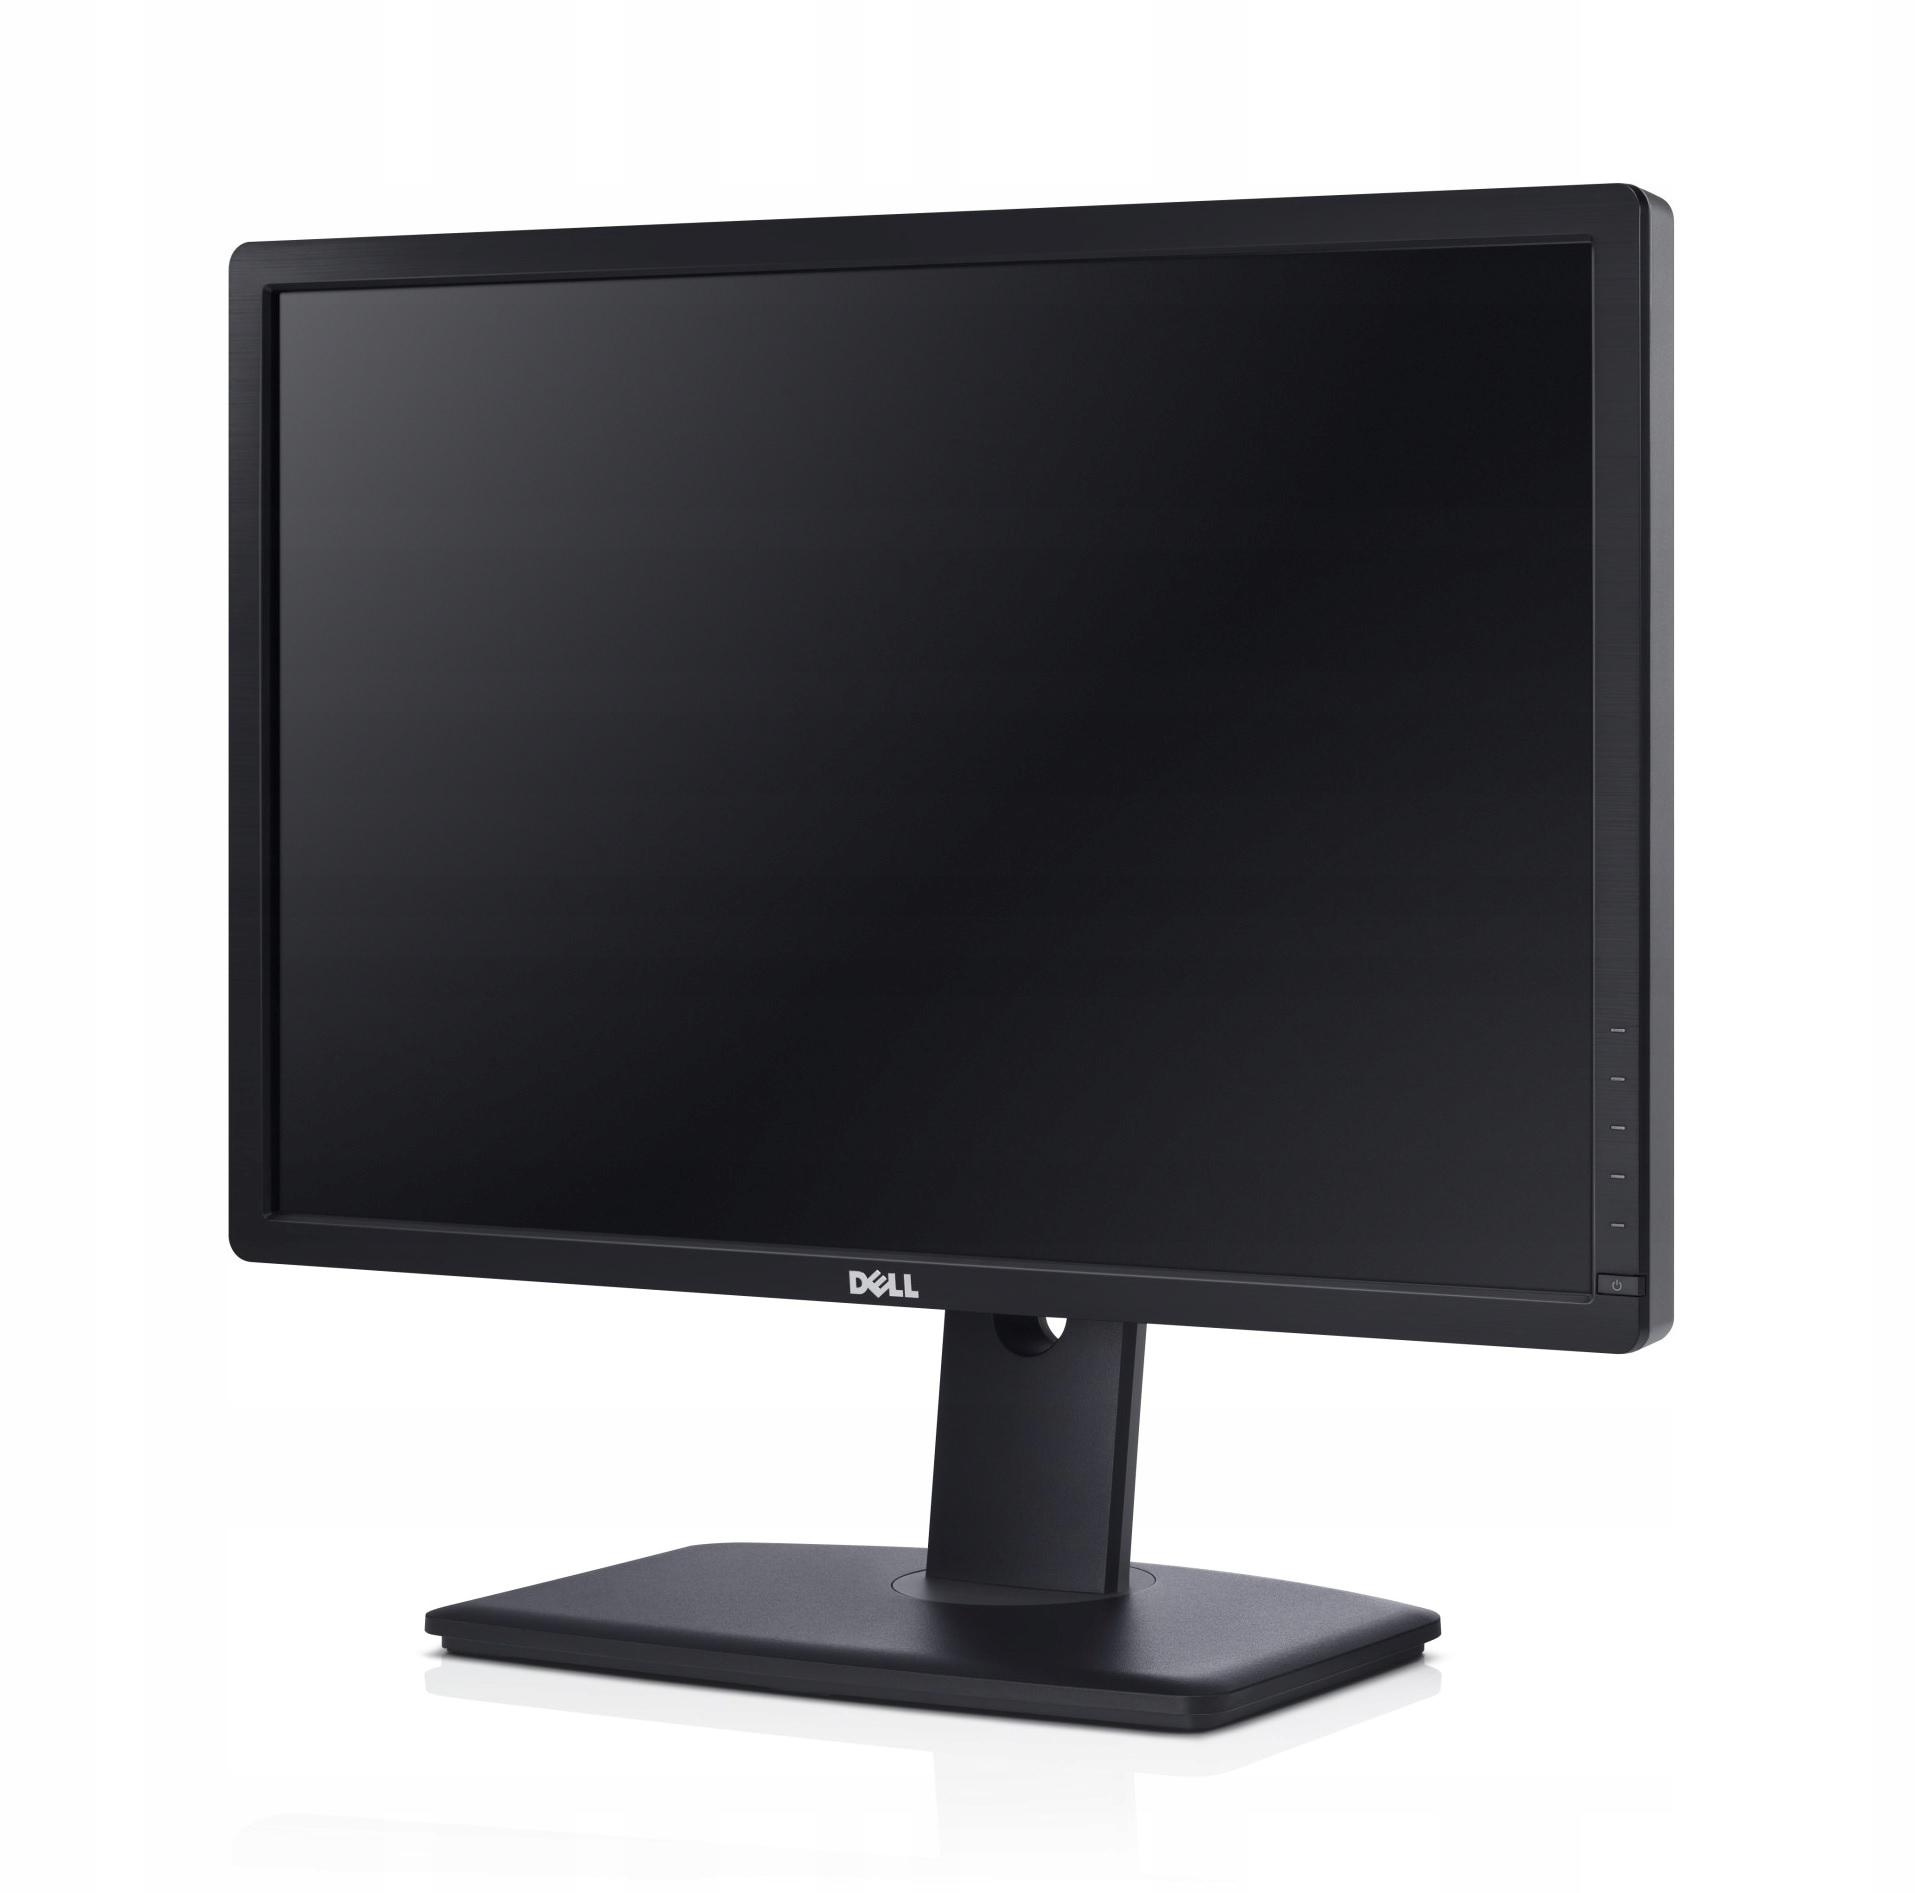 Monitor Dell Ultrasharp U2413f 24'' LCD LED AH-IPS